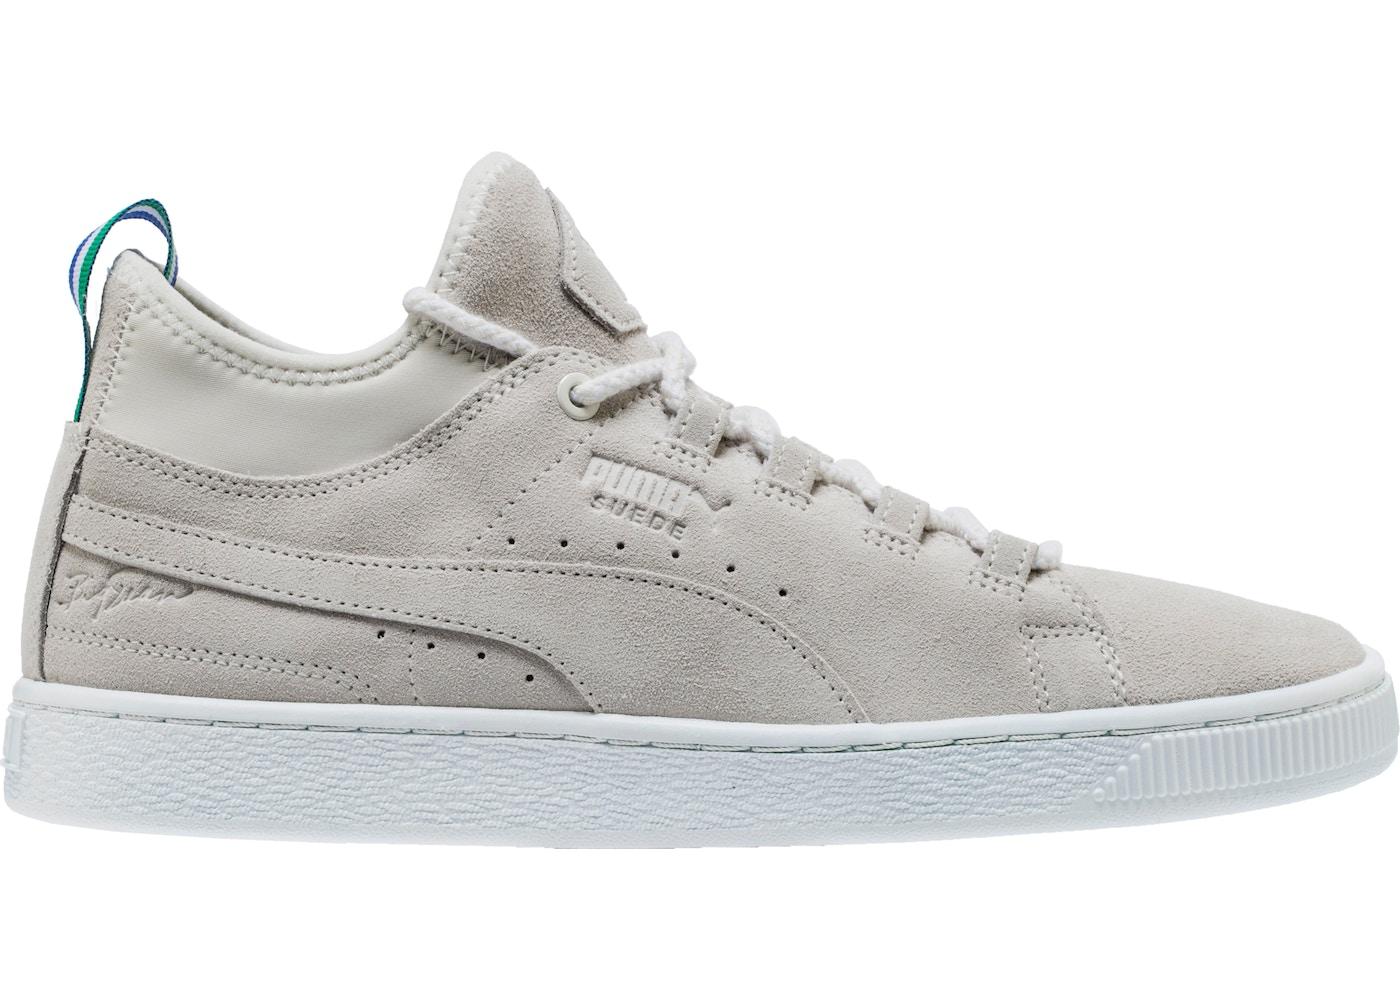 huge selection of a94e9 e425e Puma Size 15 Shoes - Release Date